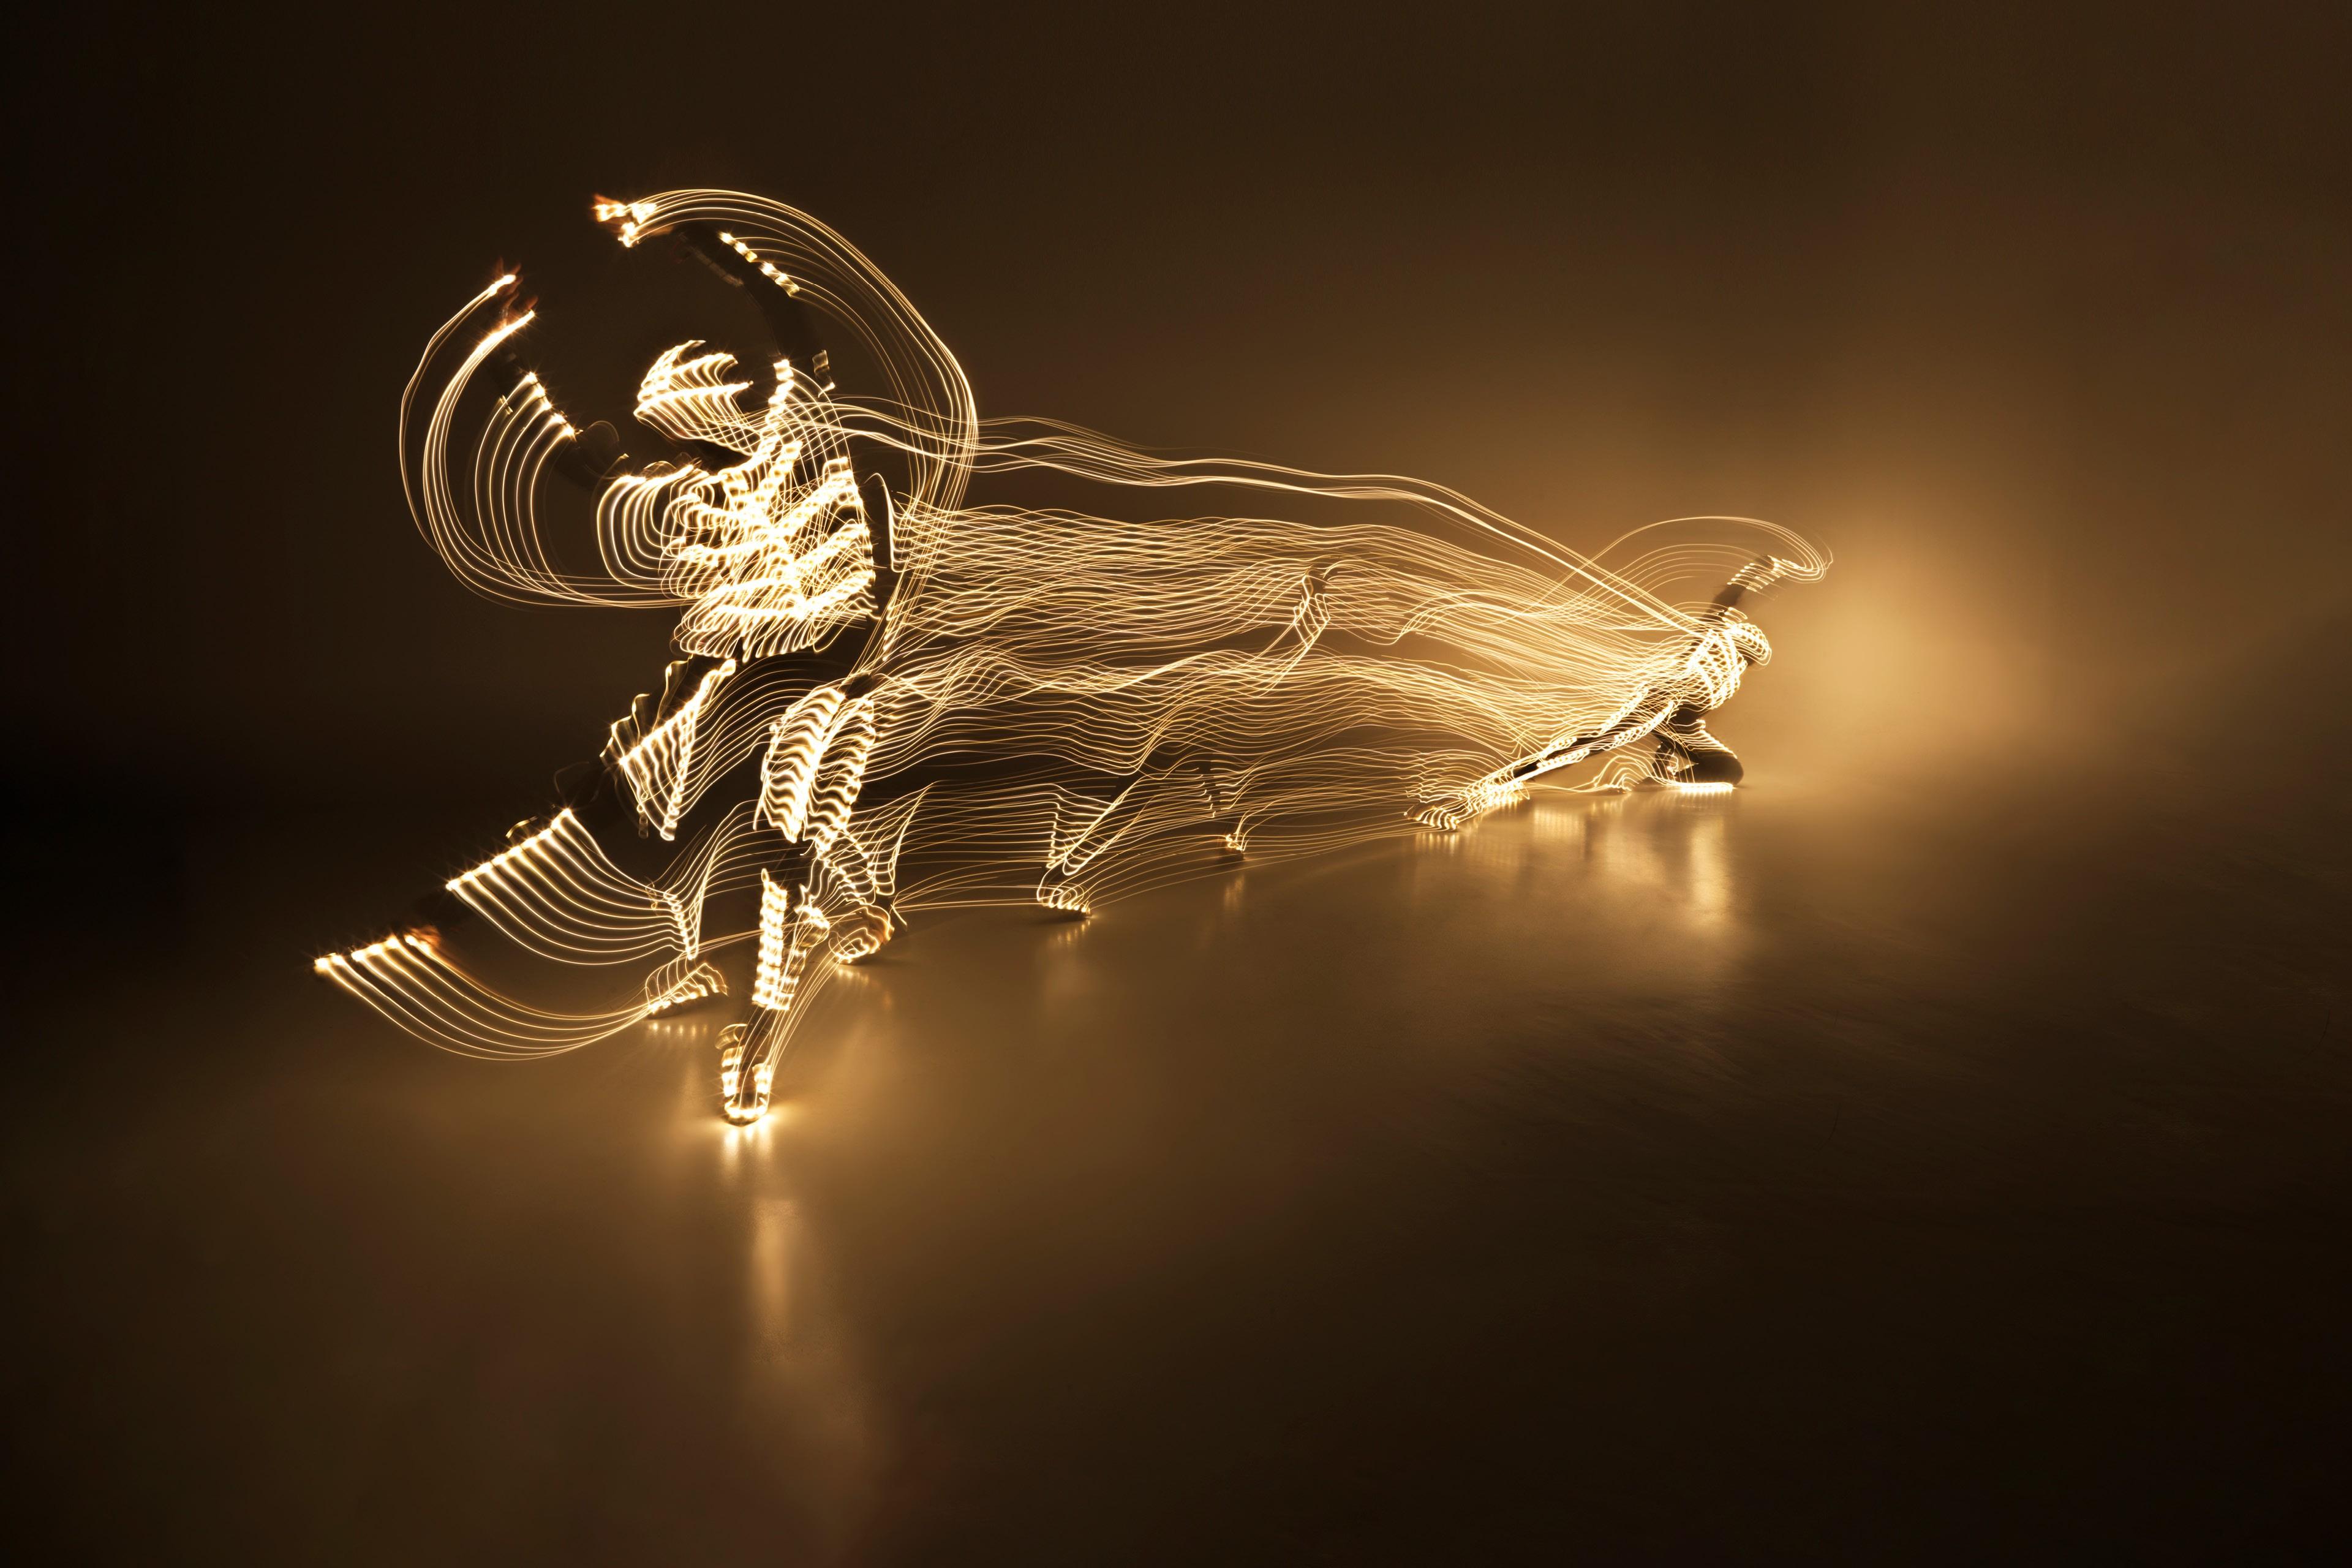 Ballet dancer in a light suit